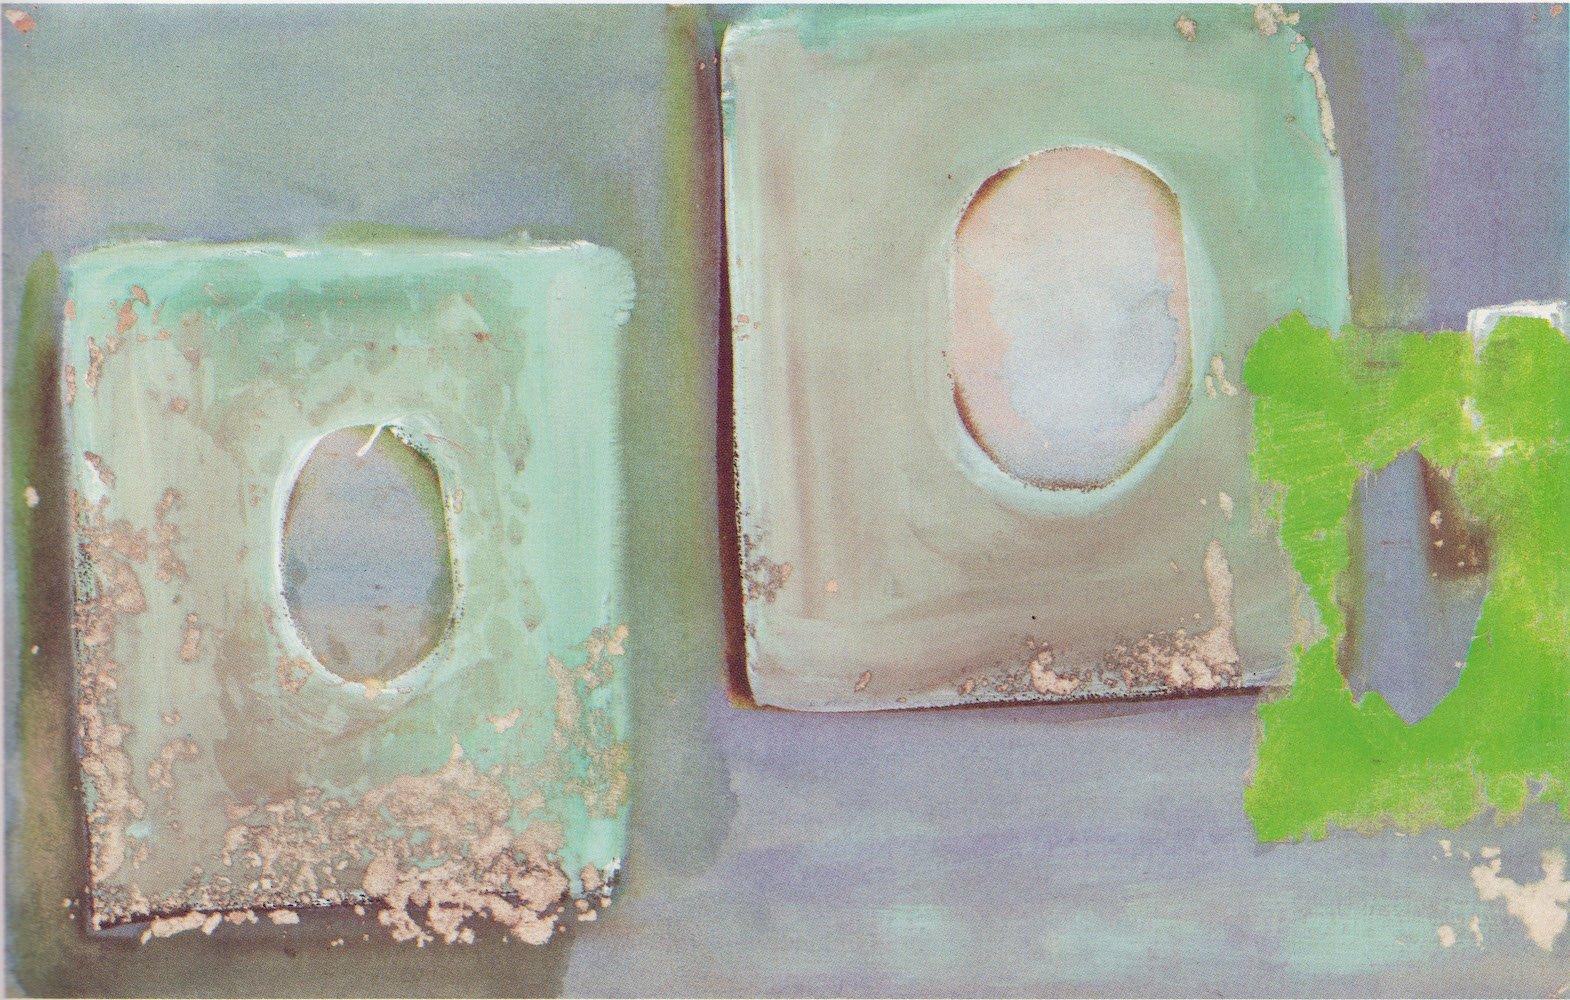 "Dusti Bongé, Green Paper Holes, 1978, mixed media collage, 13"" x 20"". Paul Bongé Collection"